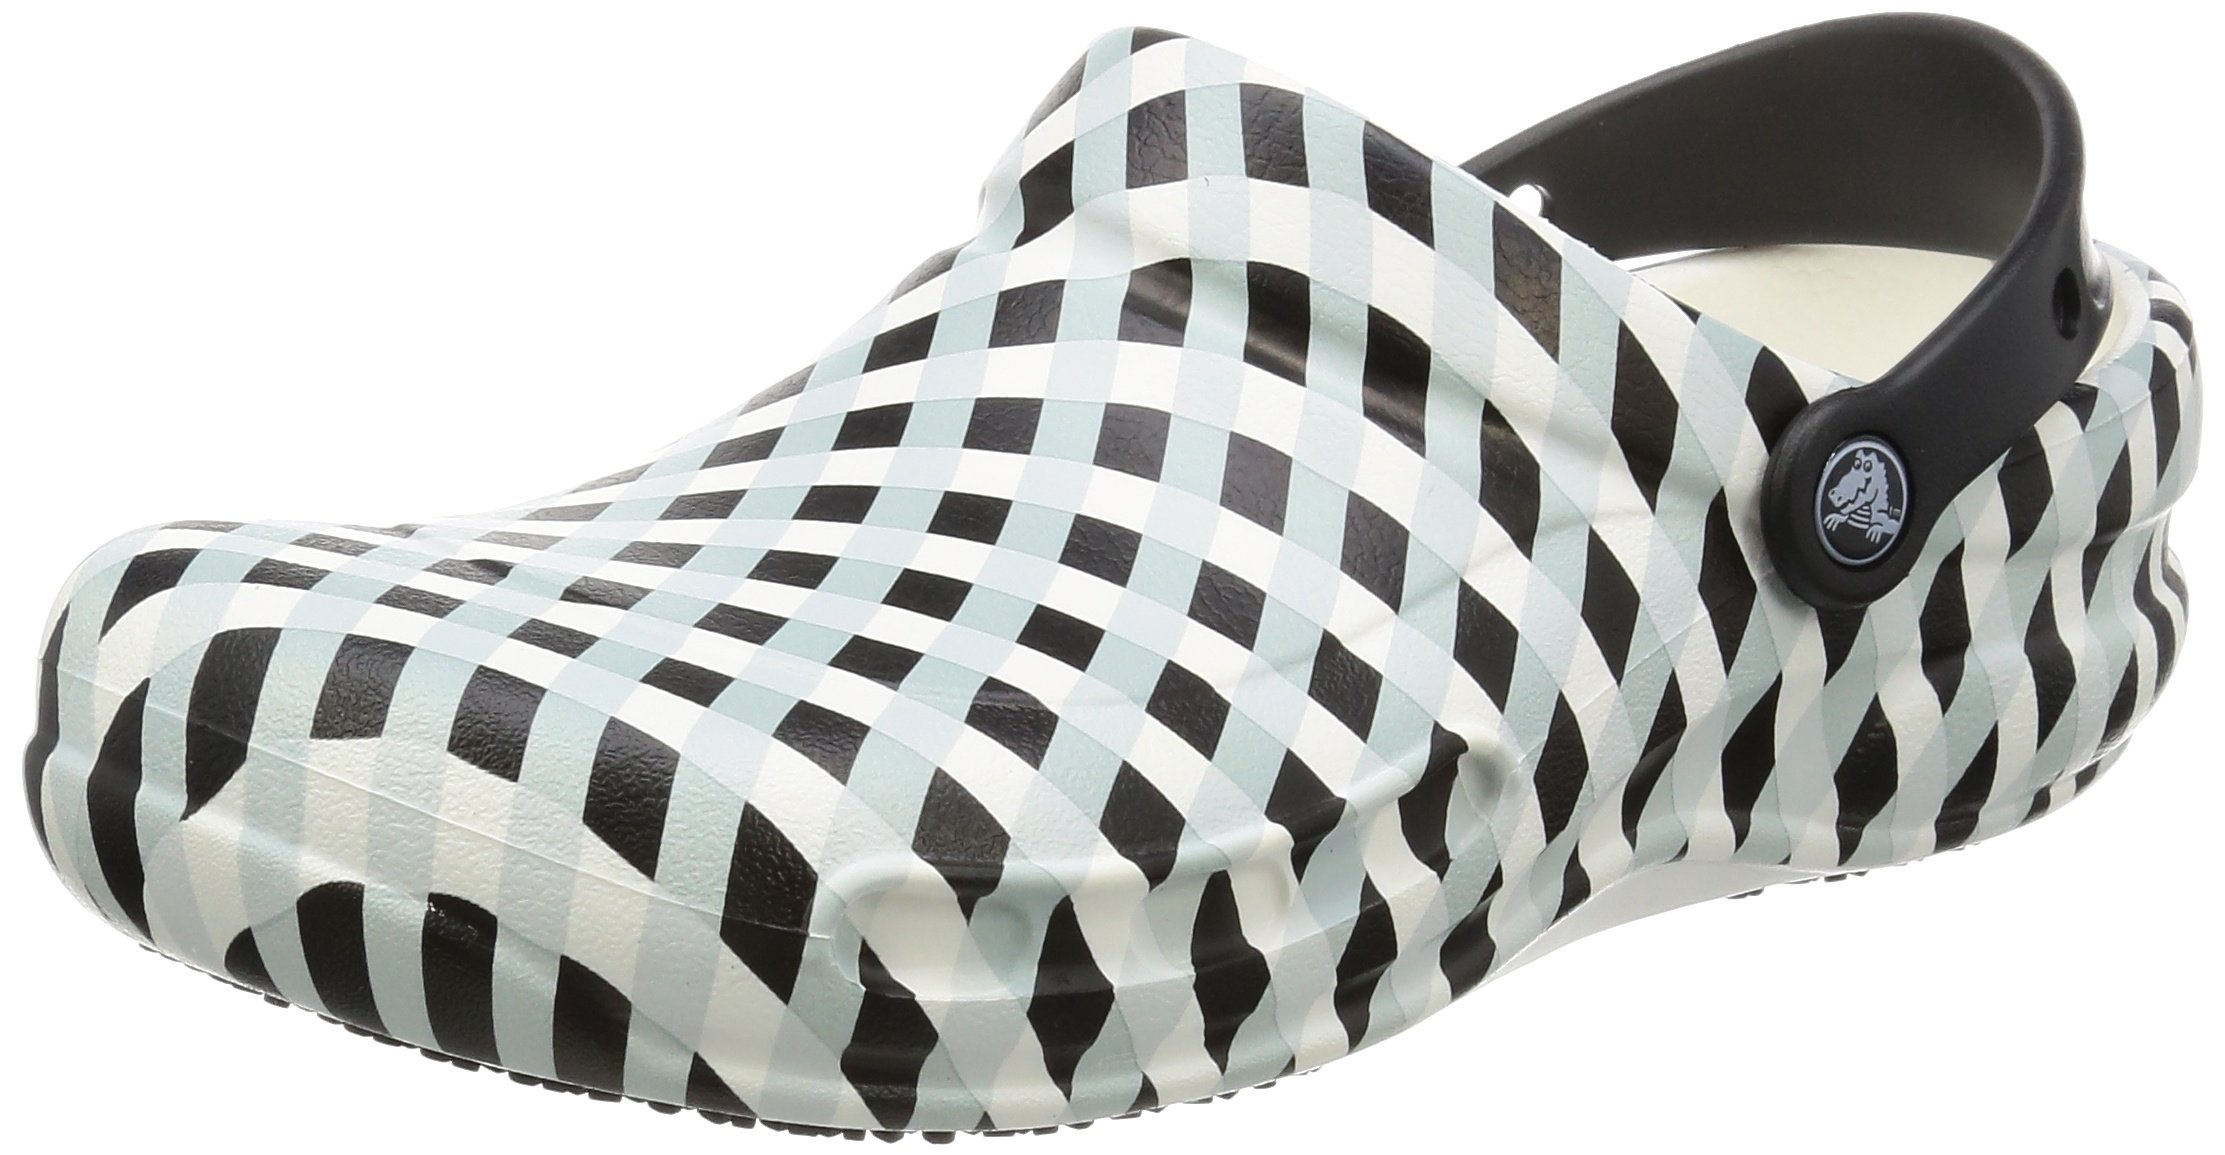 2a6a513bf370 crocs Unisex-Erwachsene Bistro Graphic U Clogs. Unisex Adult Crocs Bistro  Gin Ghmclg Clogs